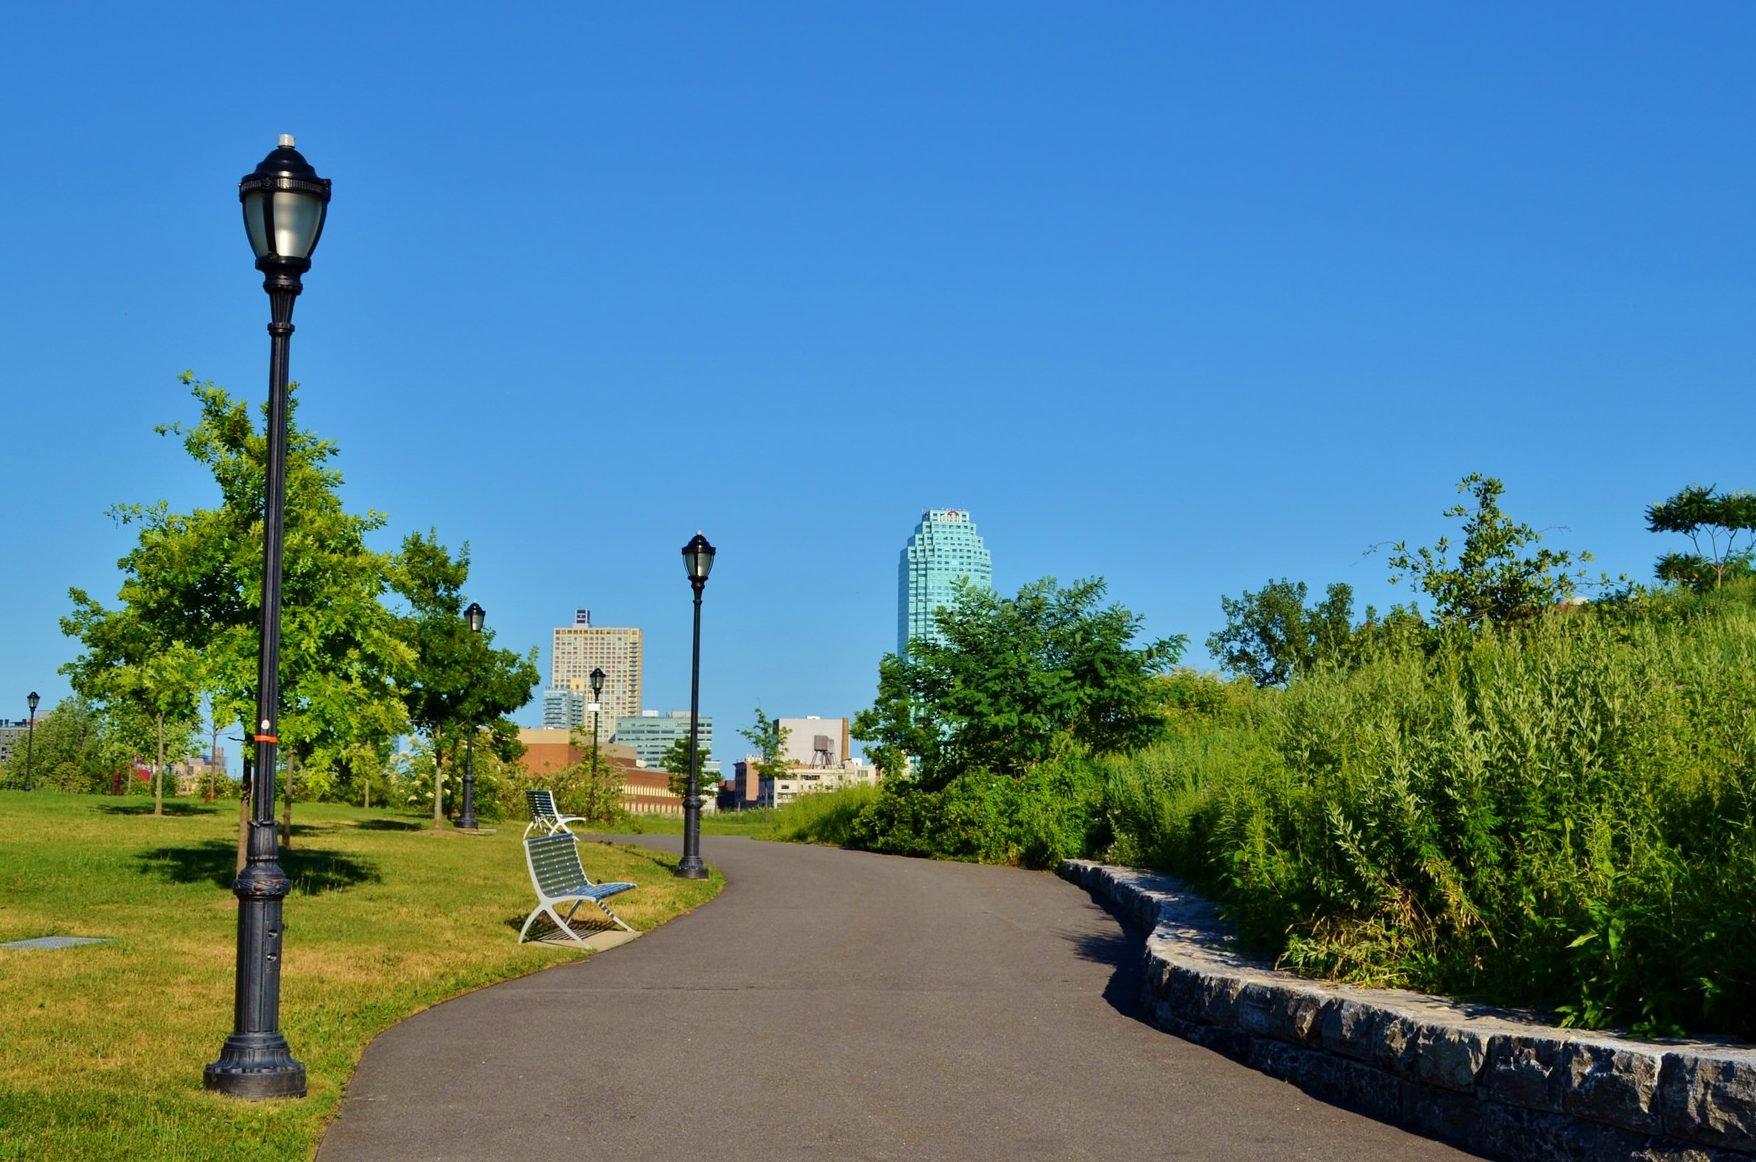 South Point Park, Roosevelt Island